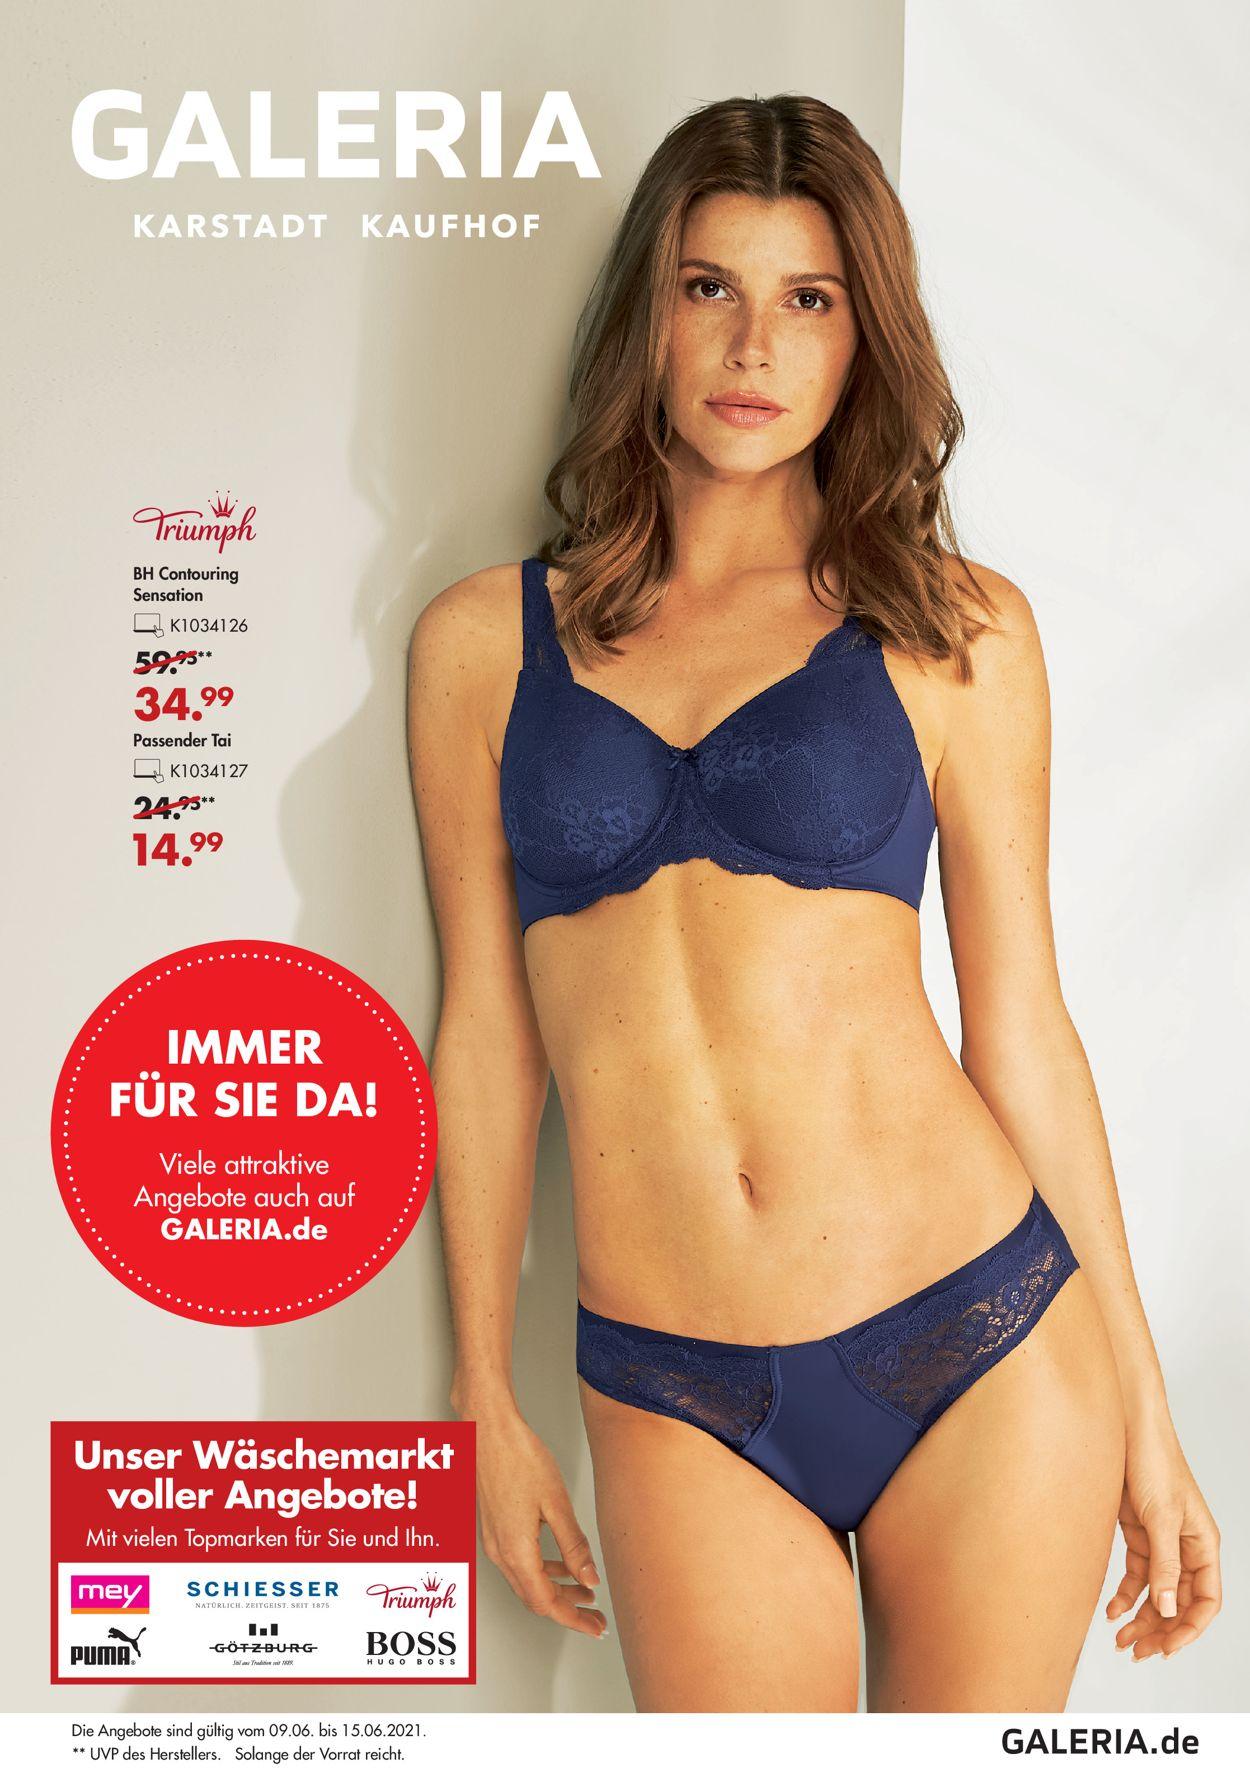 GALERIA Kaufhof Prospekt - Aktuell vom 09.06-15.06.2021